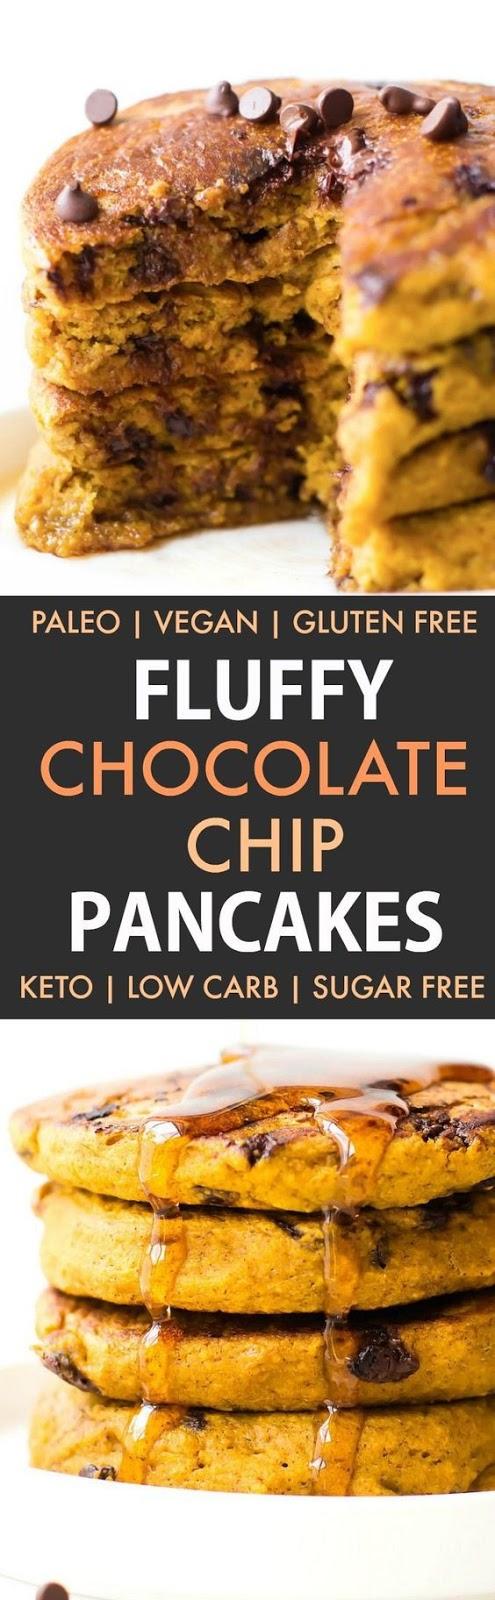 Fluffy Low Carb Keto Pancakes (Paleo, Vegan)